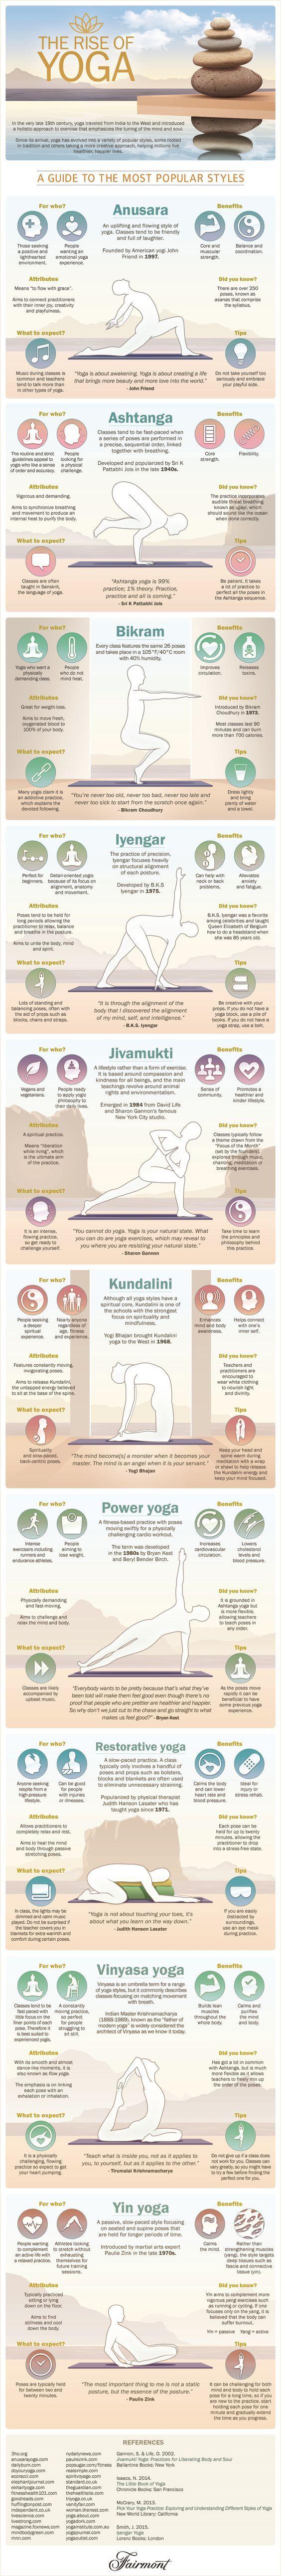 Bikram, Ashtanga, power yoga and Anusara explained.